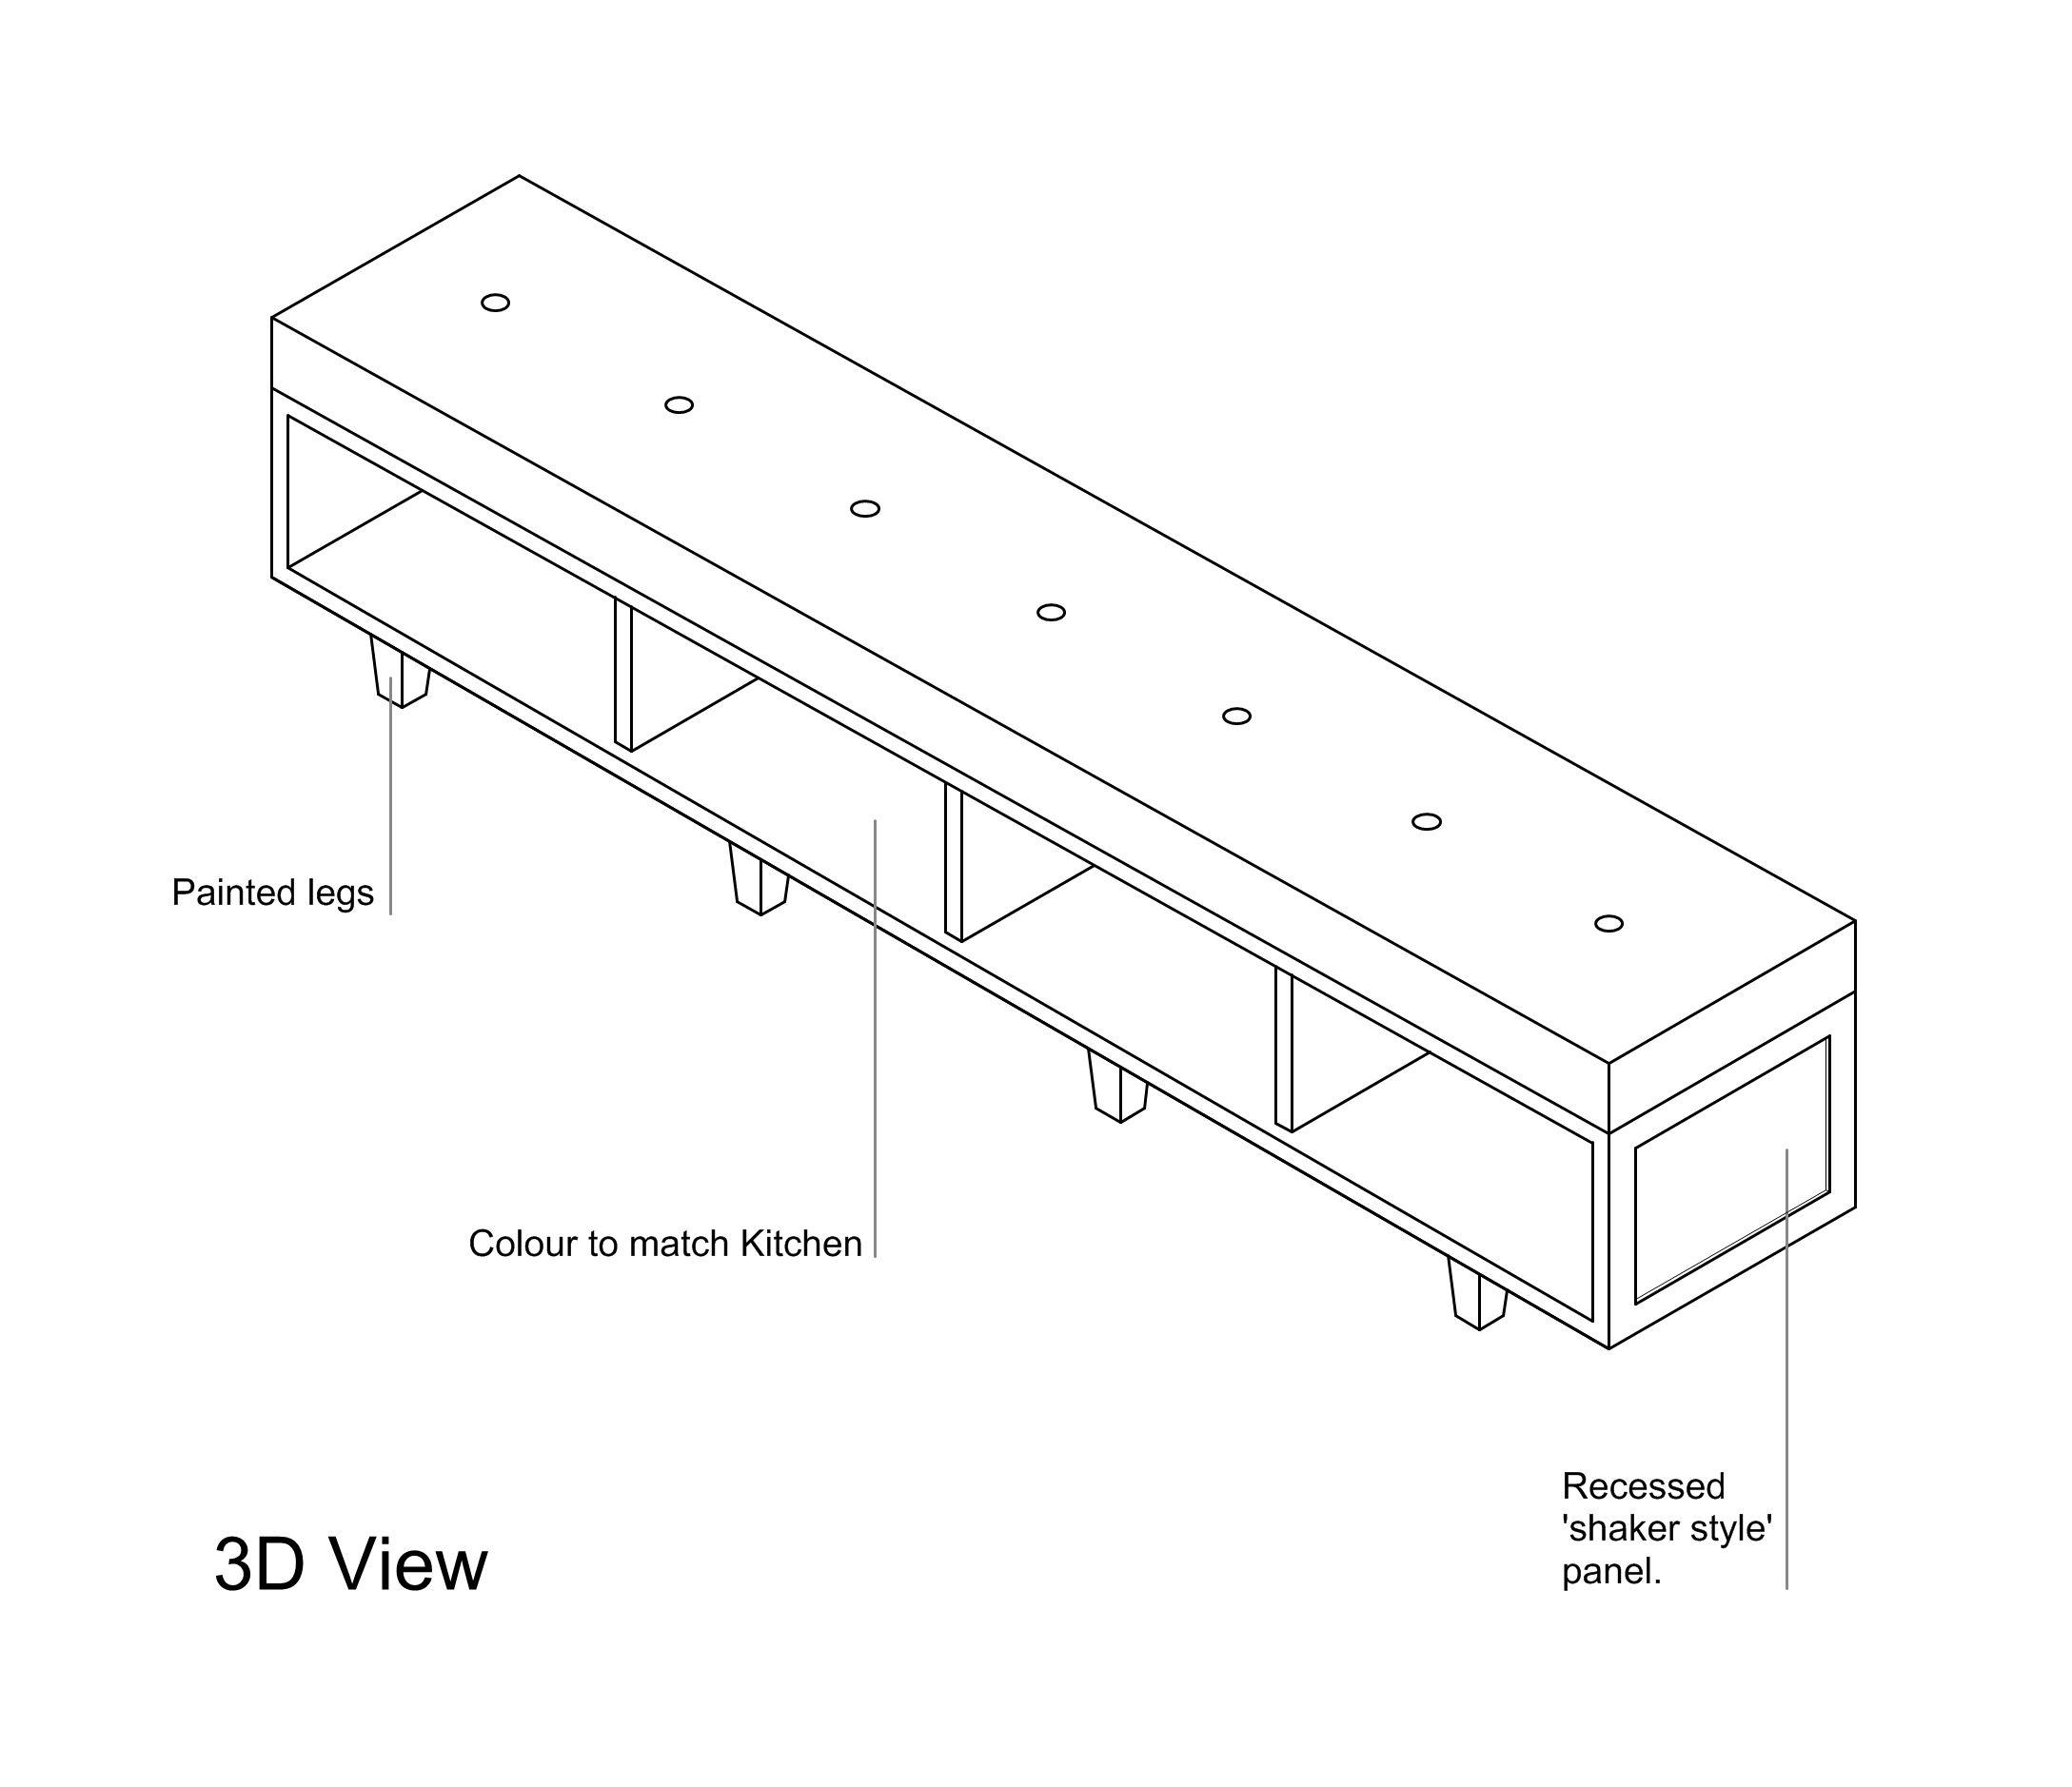 Furniture Detail Drawings » KENT GRIFFITHS DESIGN